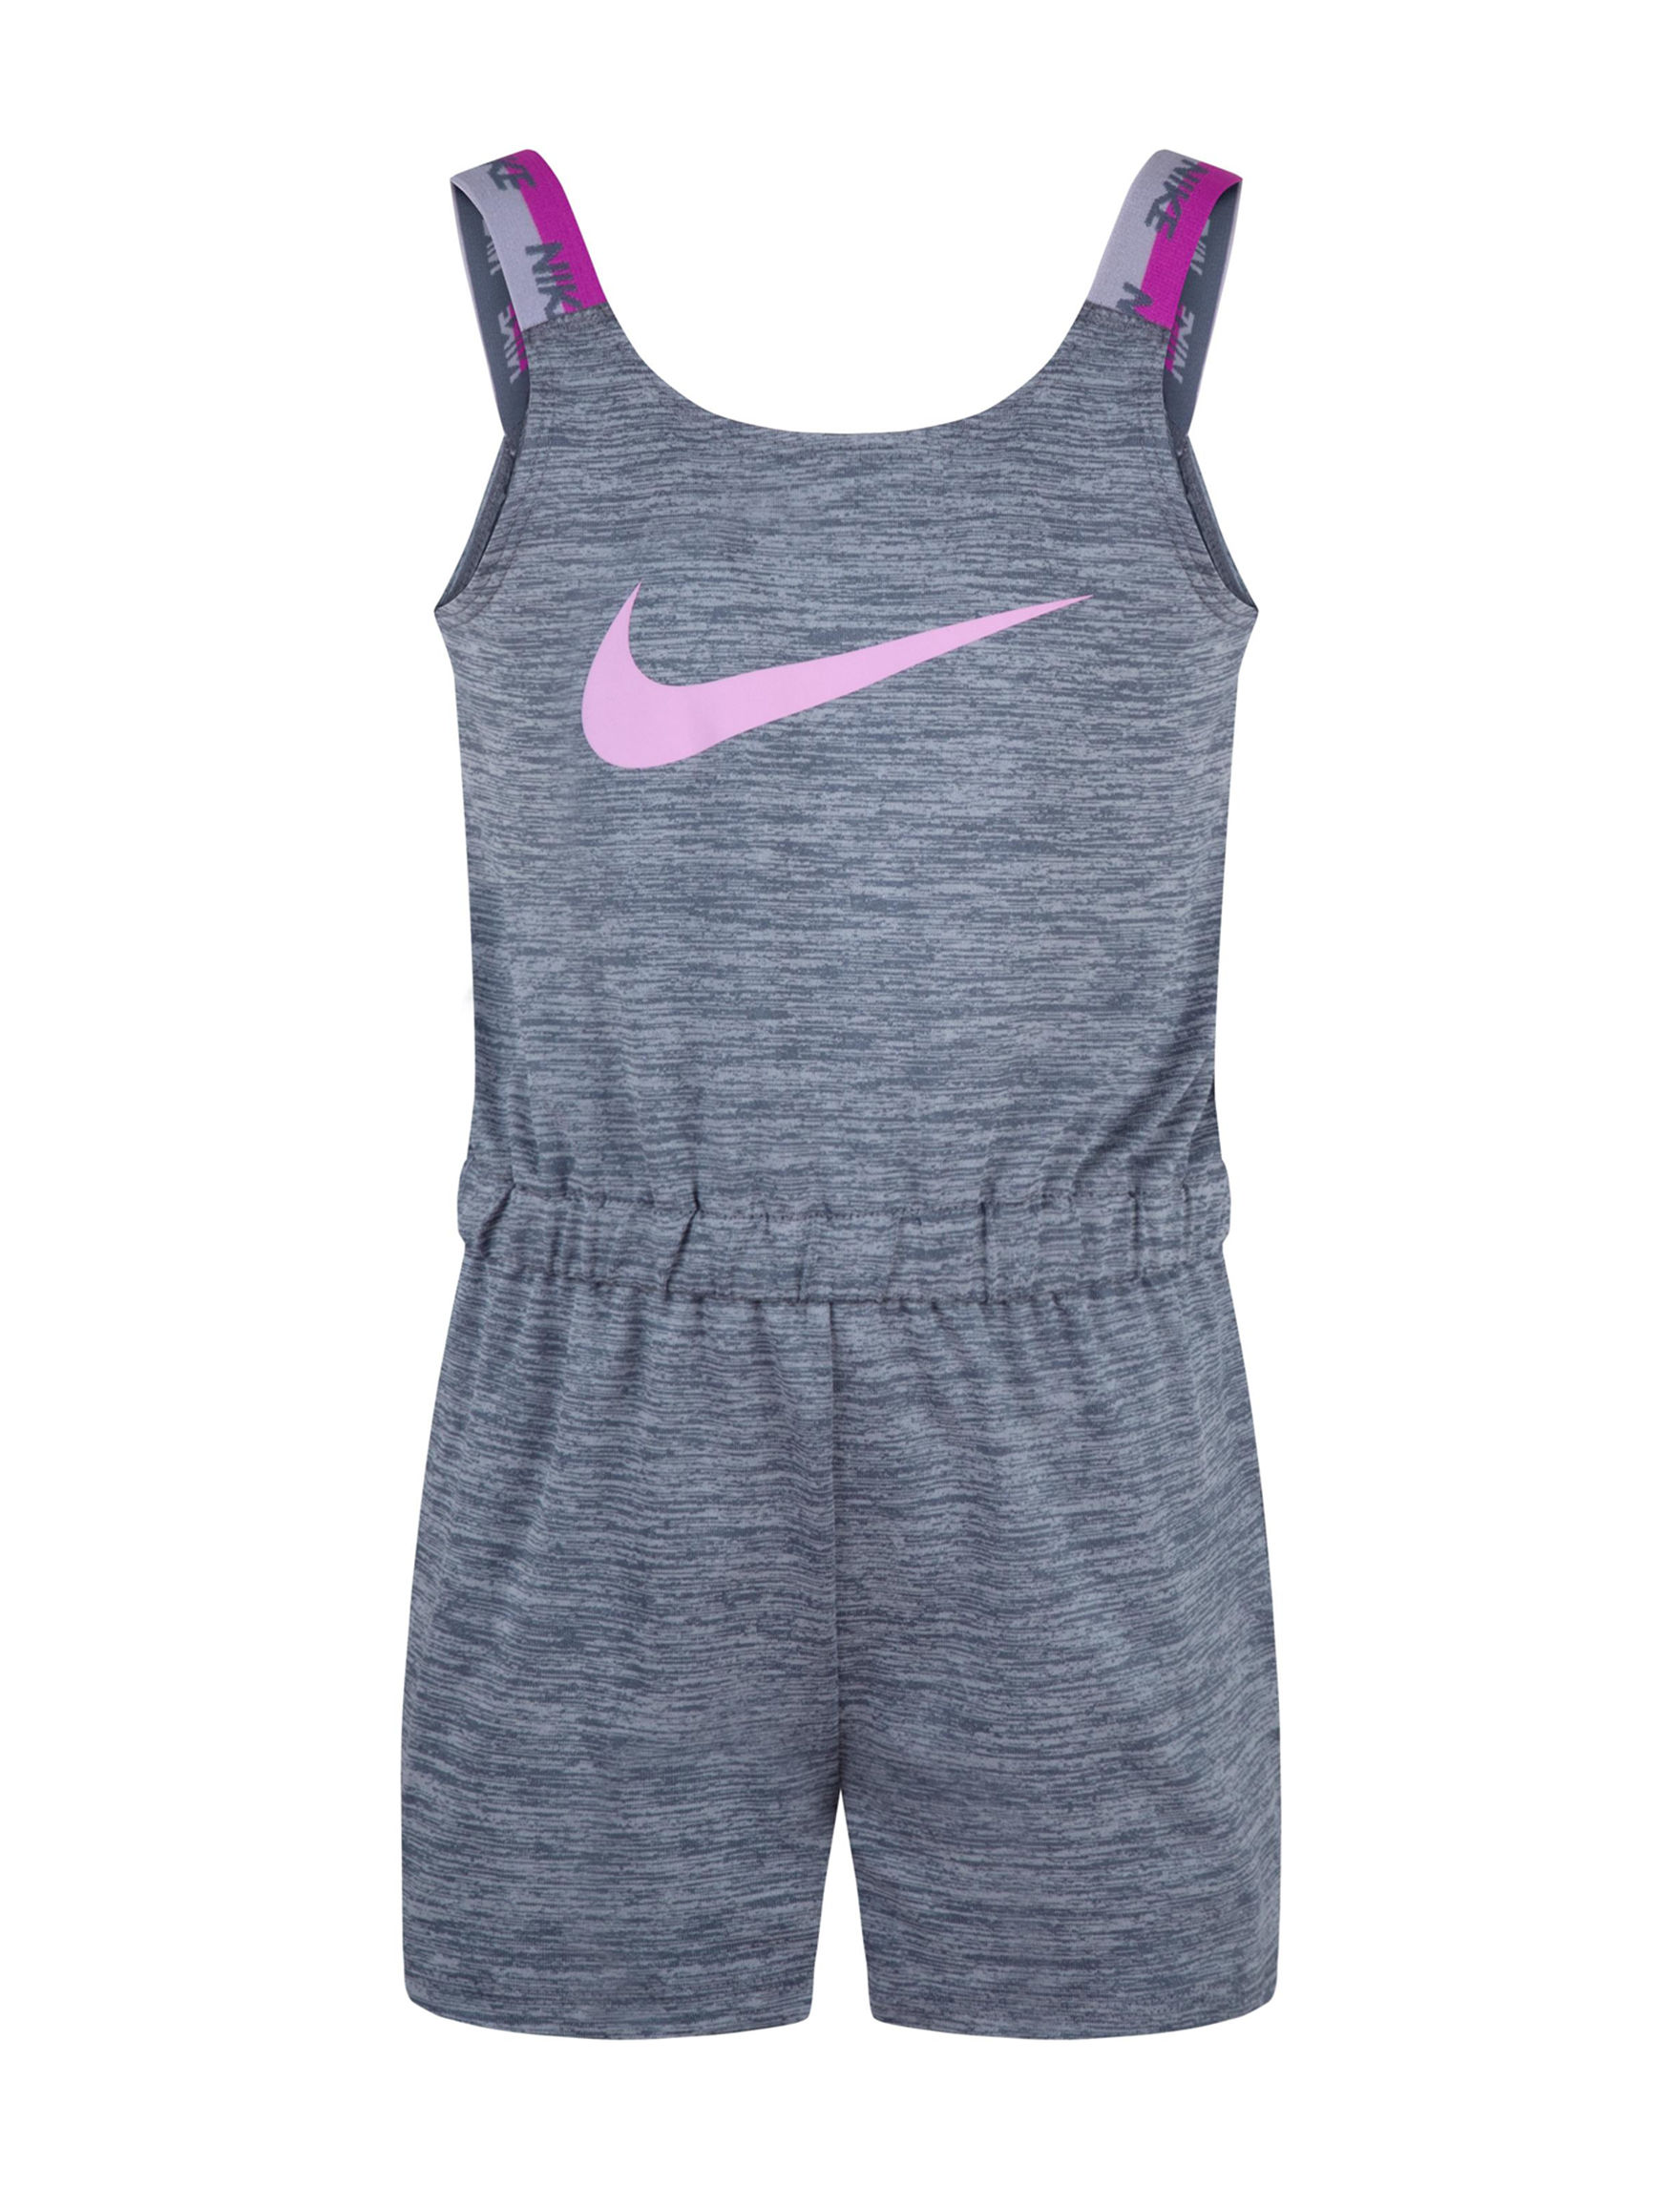 Nike Slate Blue / Pink